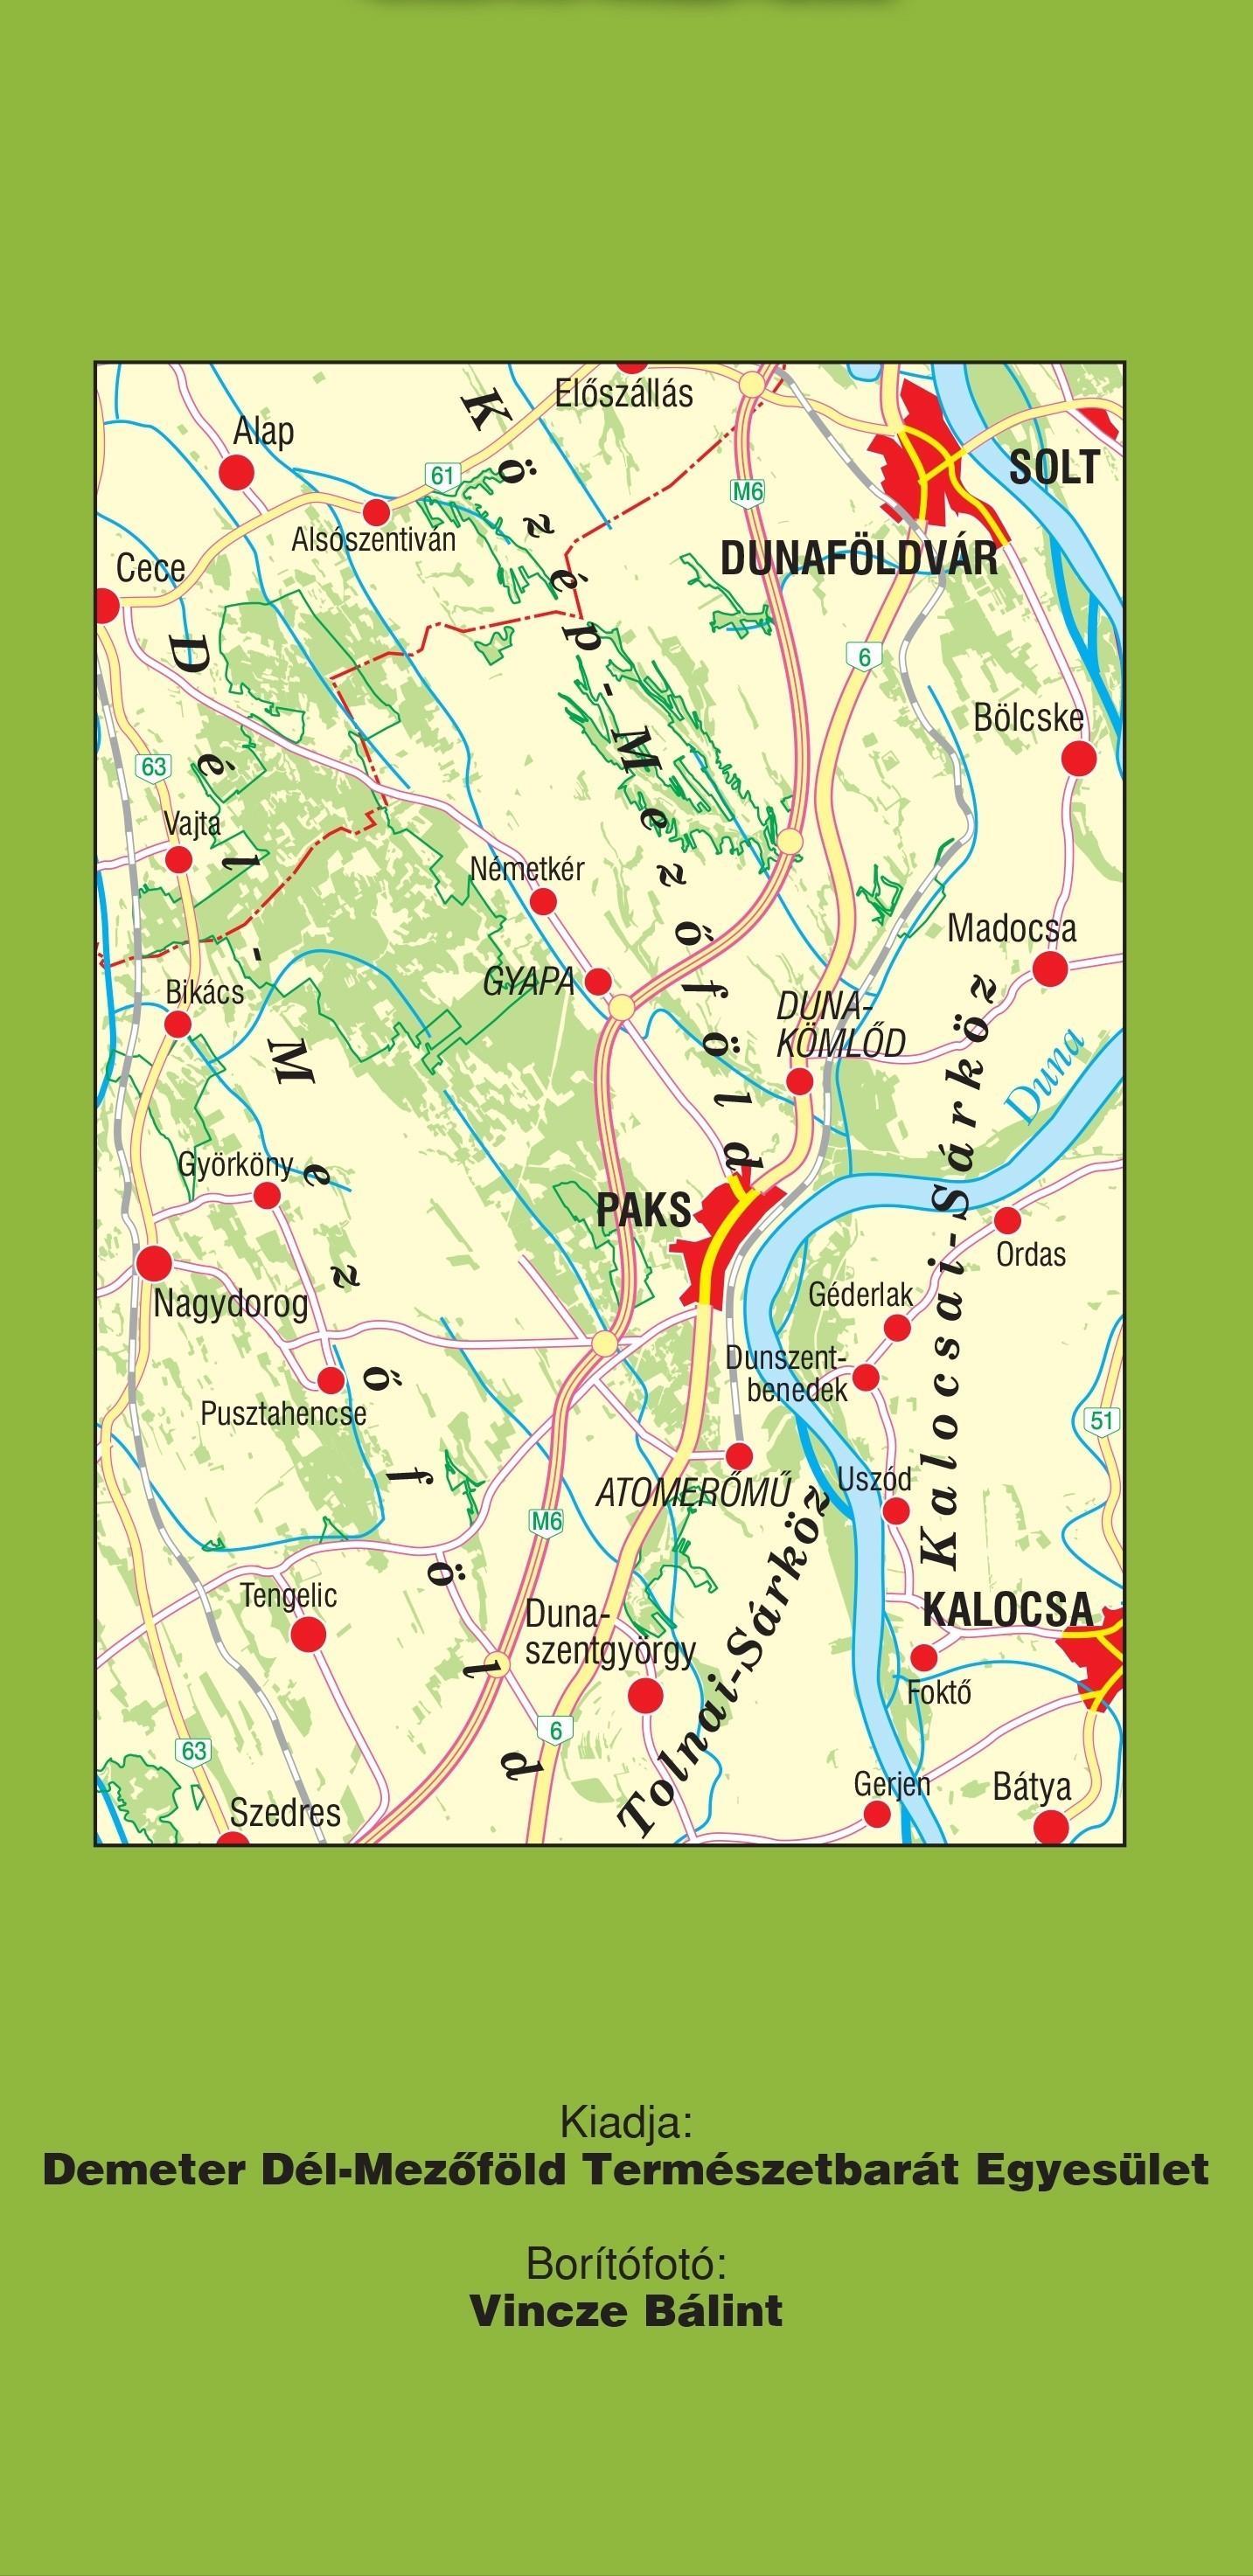 GPS kompatibilis térképmobil telefonokra / tabletekre:https://www.avenzamaps.com/maps/1161276/del-mezofold-turista-biciklis-terkep-tourist-biking-map